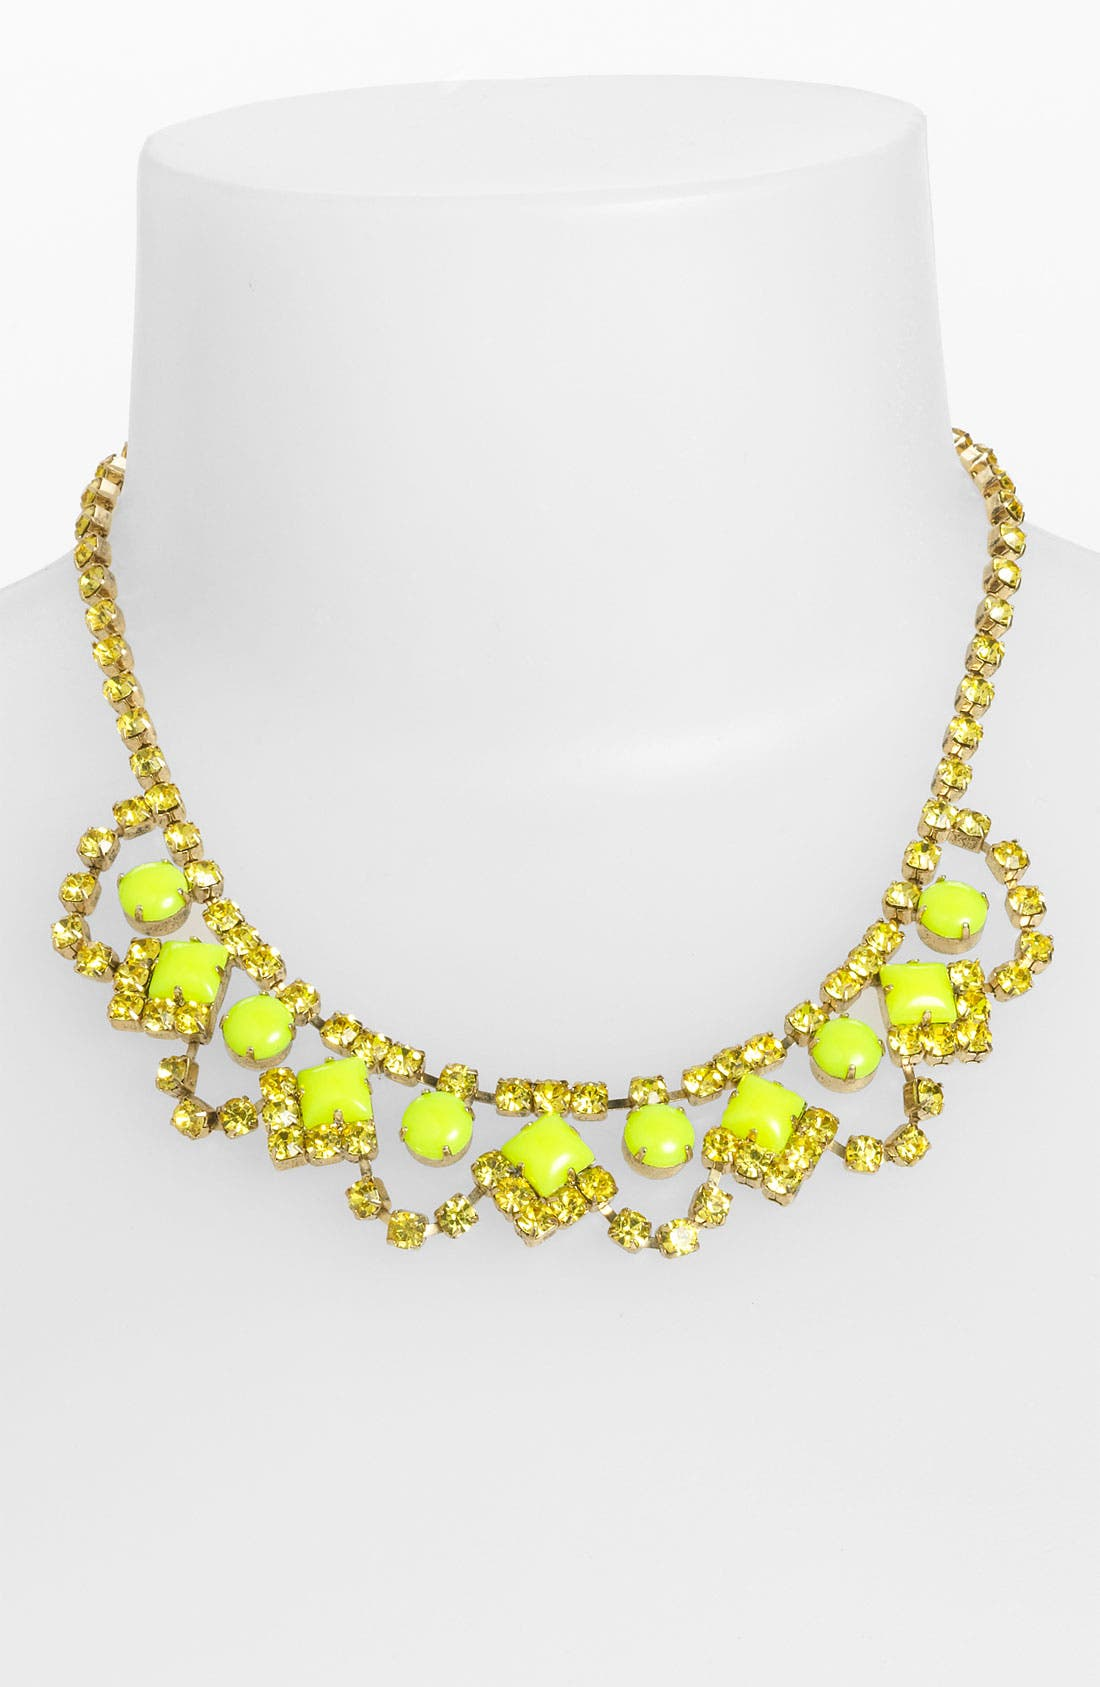 Alternate Image 1 Selected - Sweet Scandal 'Lulu' Crystal Necklace